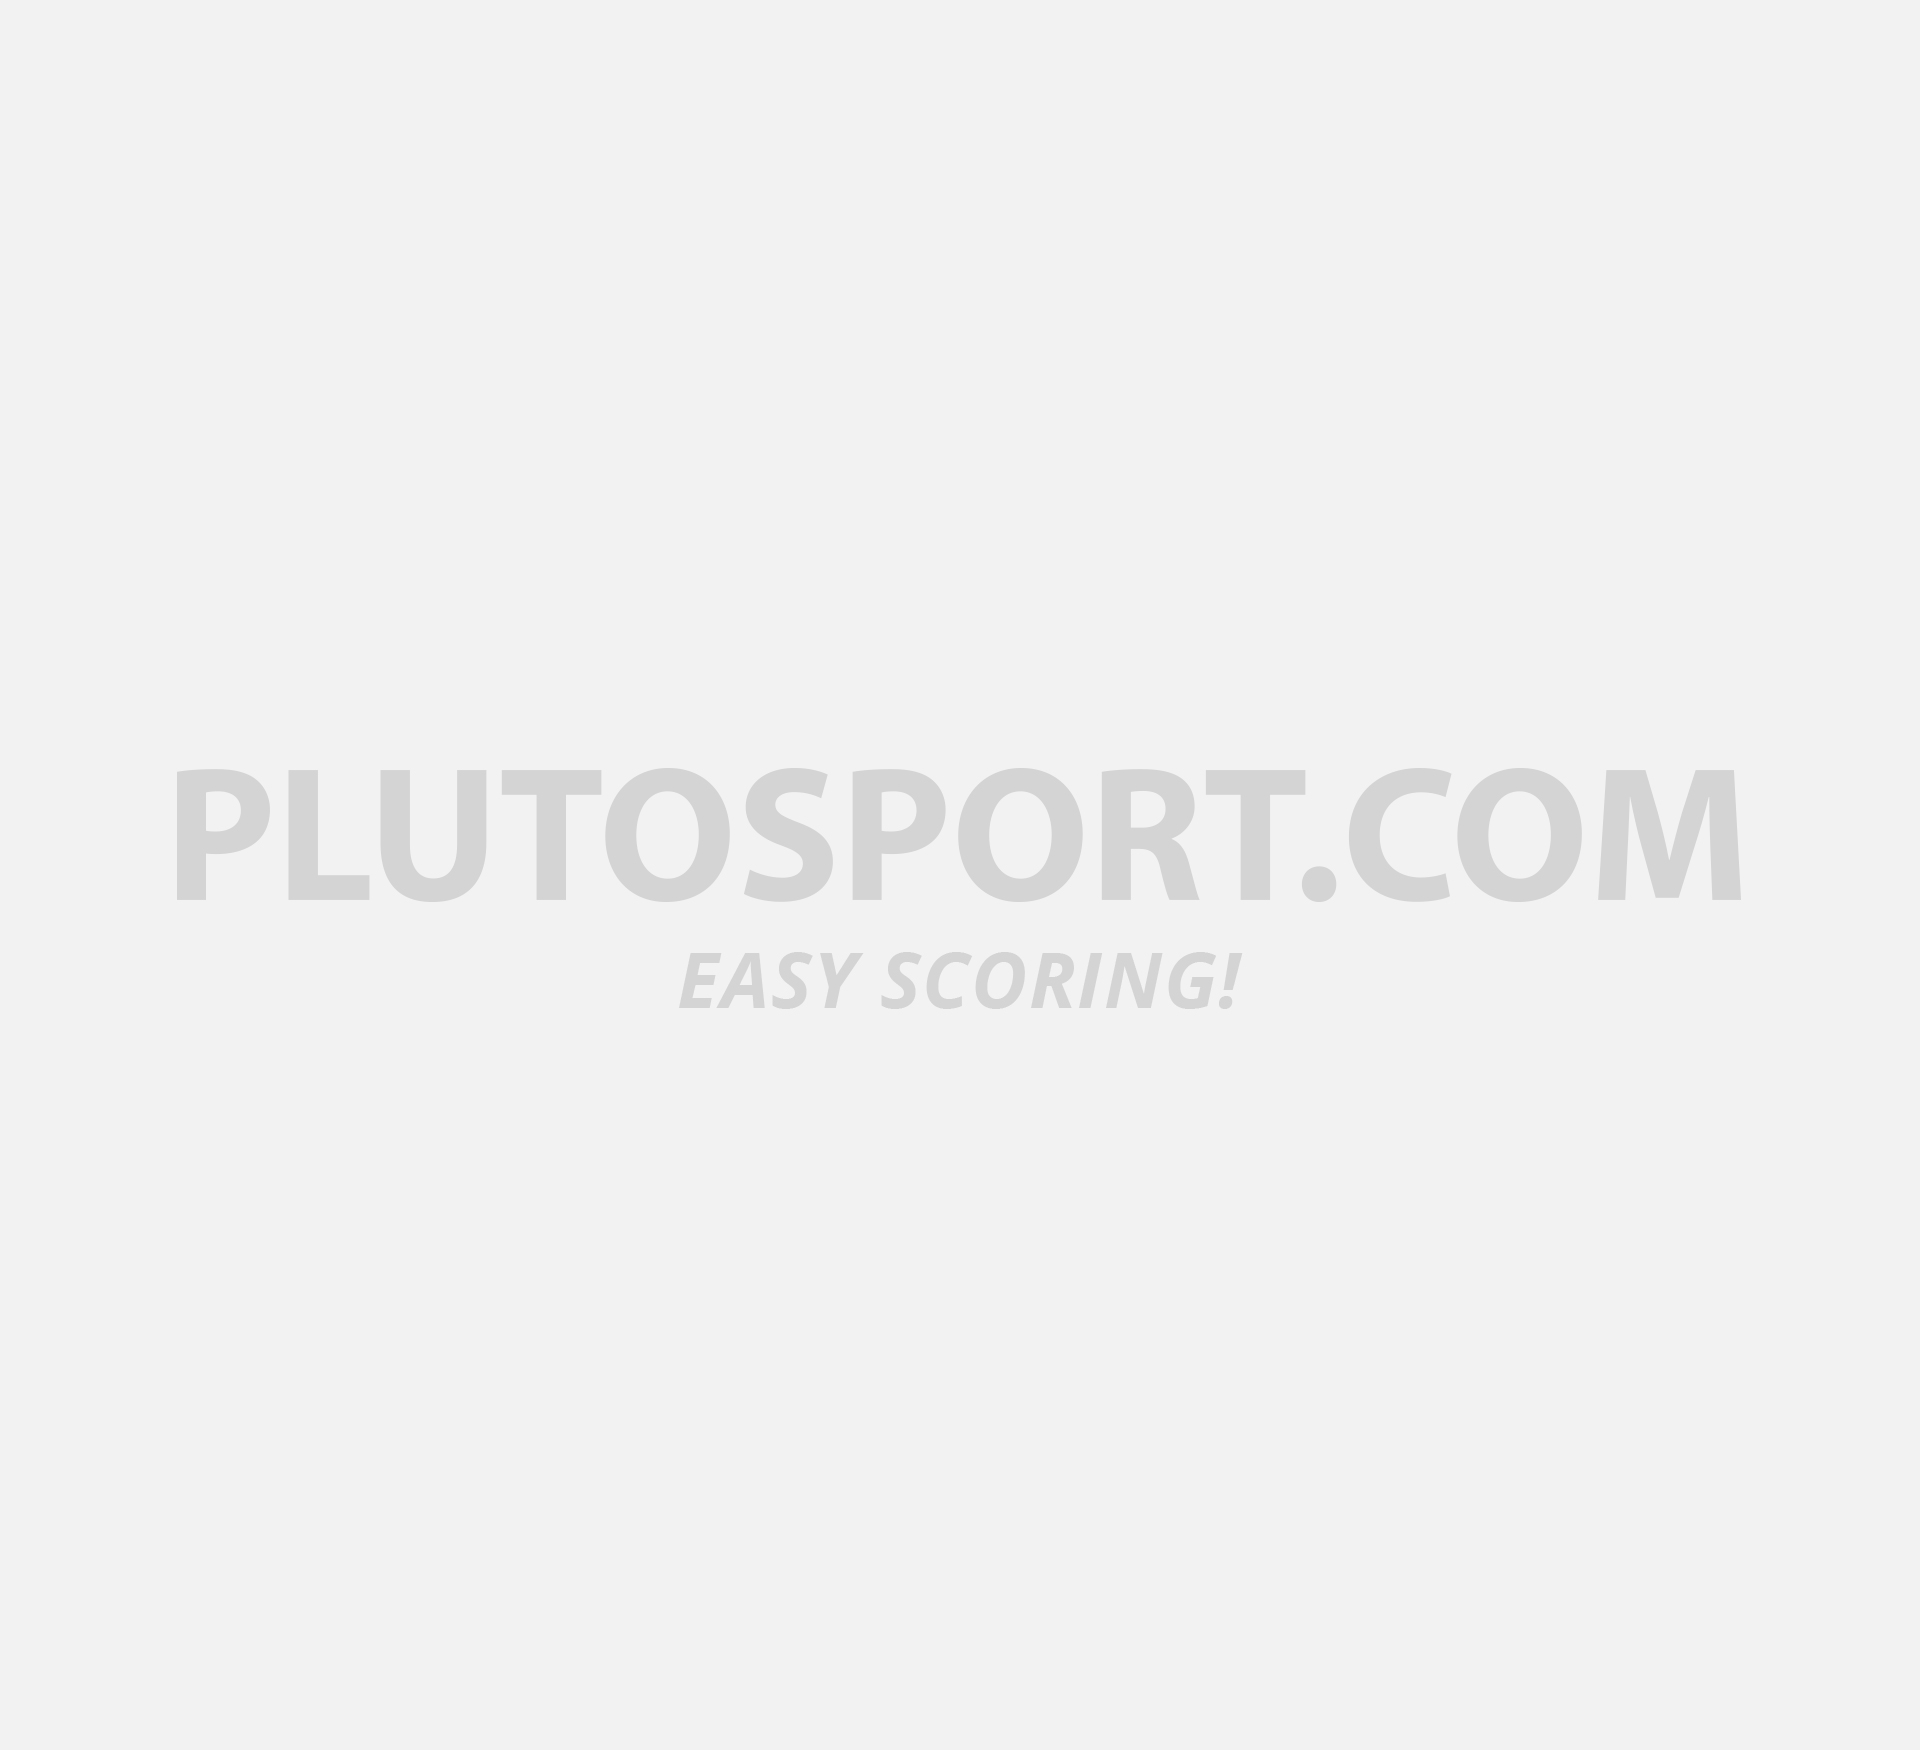 cc59a3e63ae Reebok Sublite Super Duo 3.0 - Neutral - Shoes - Running - Sports ...